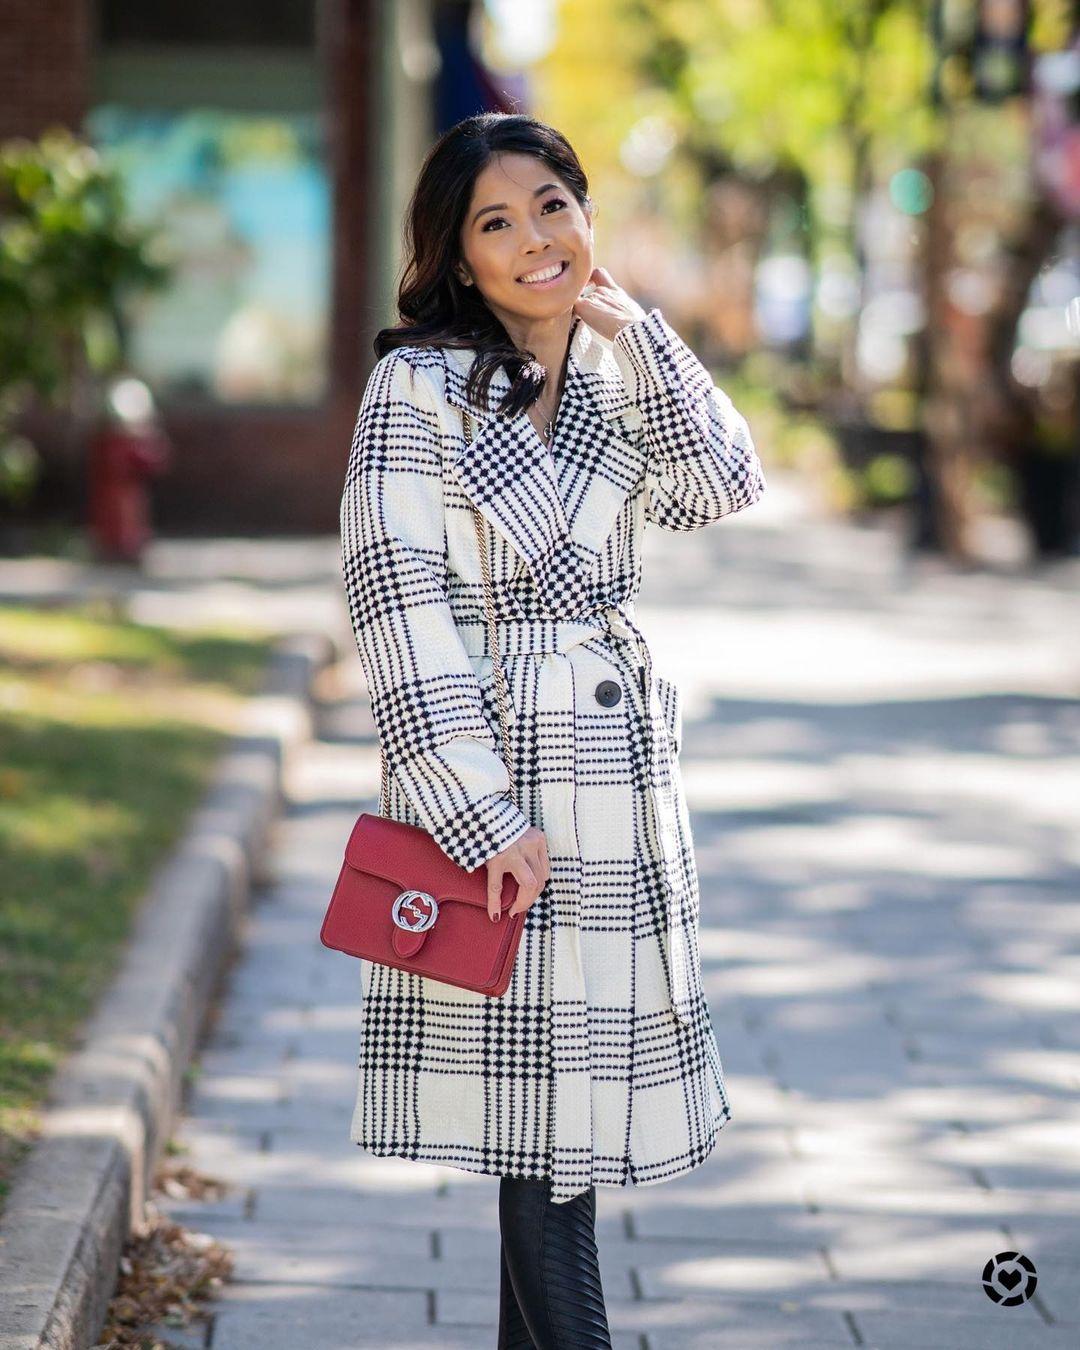 White and black plaid coat